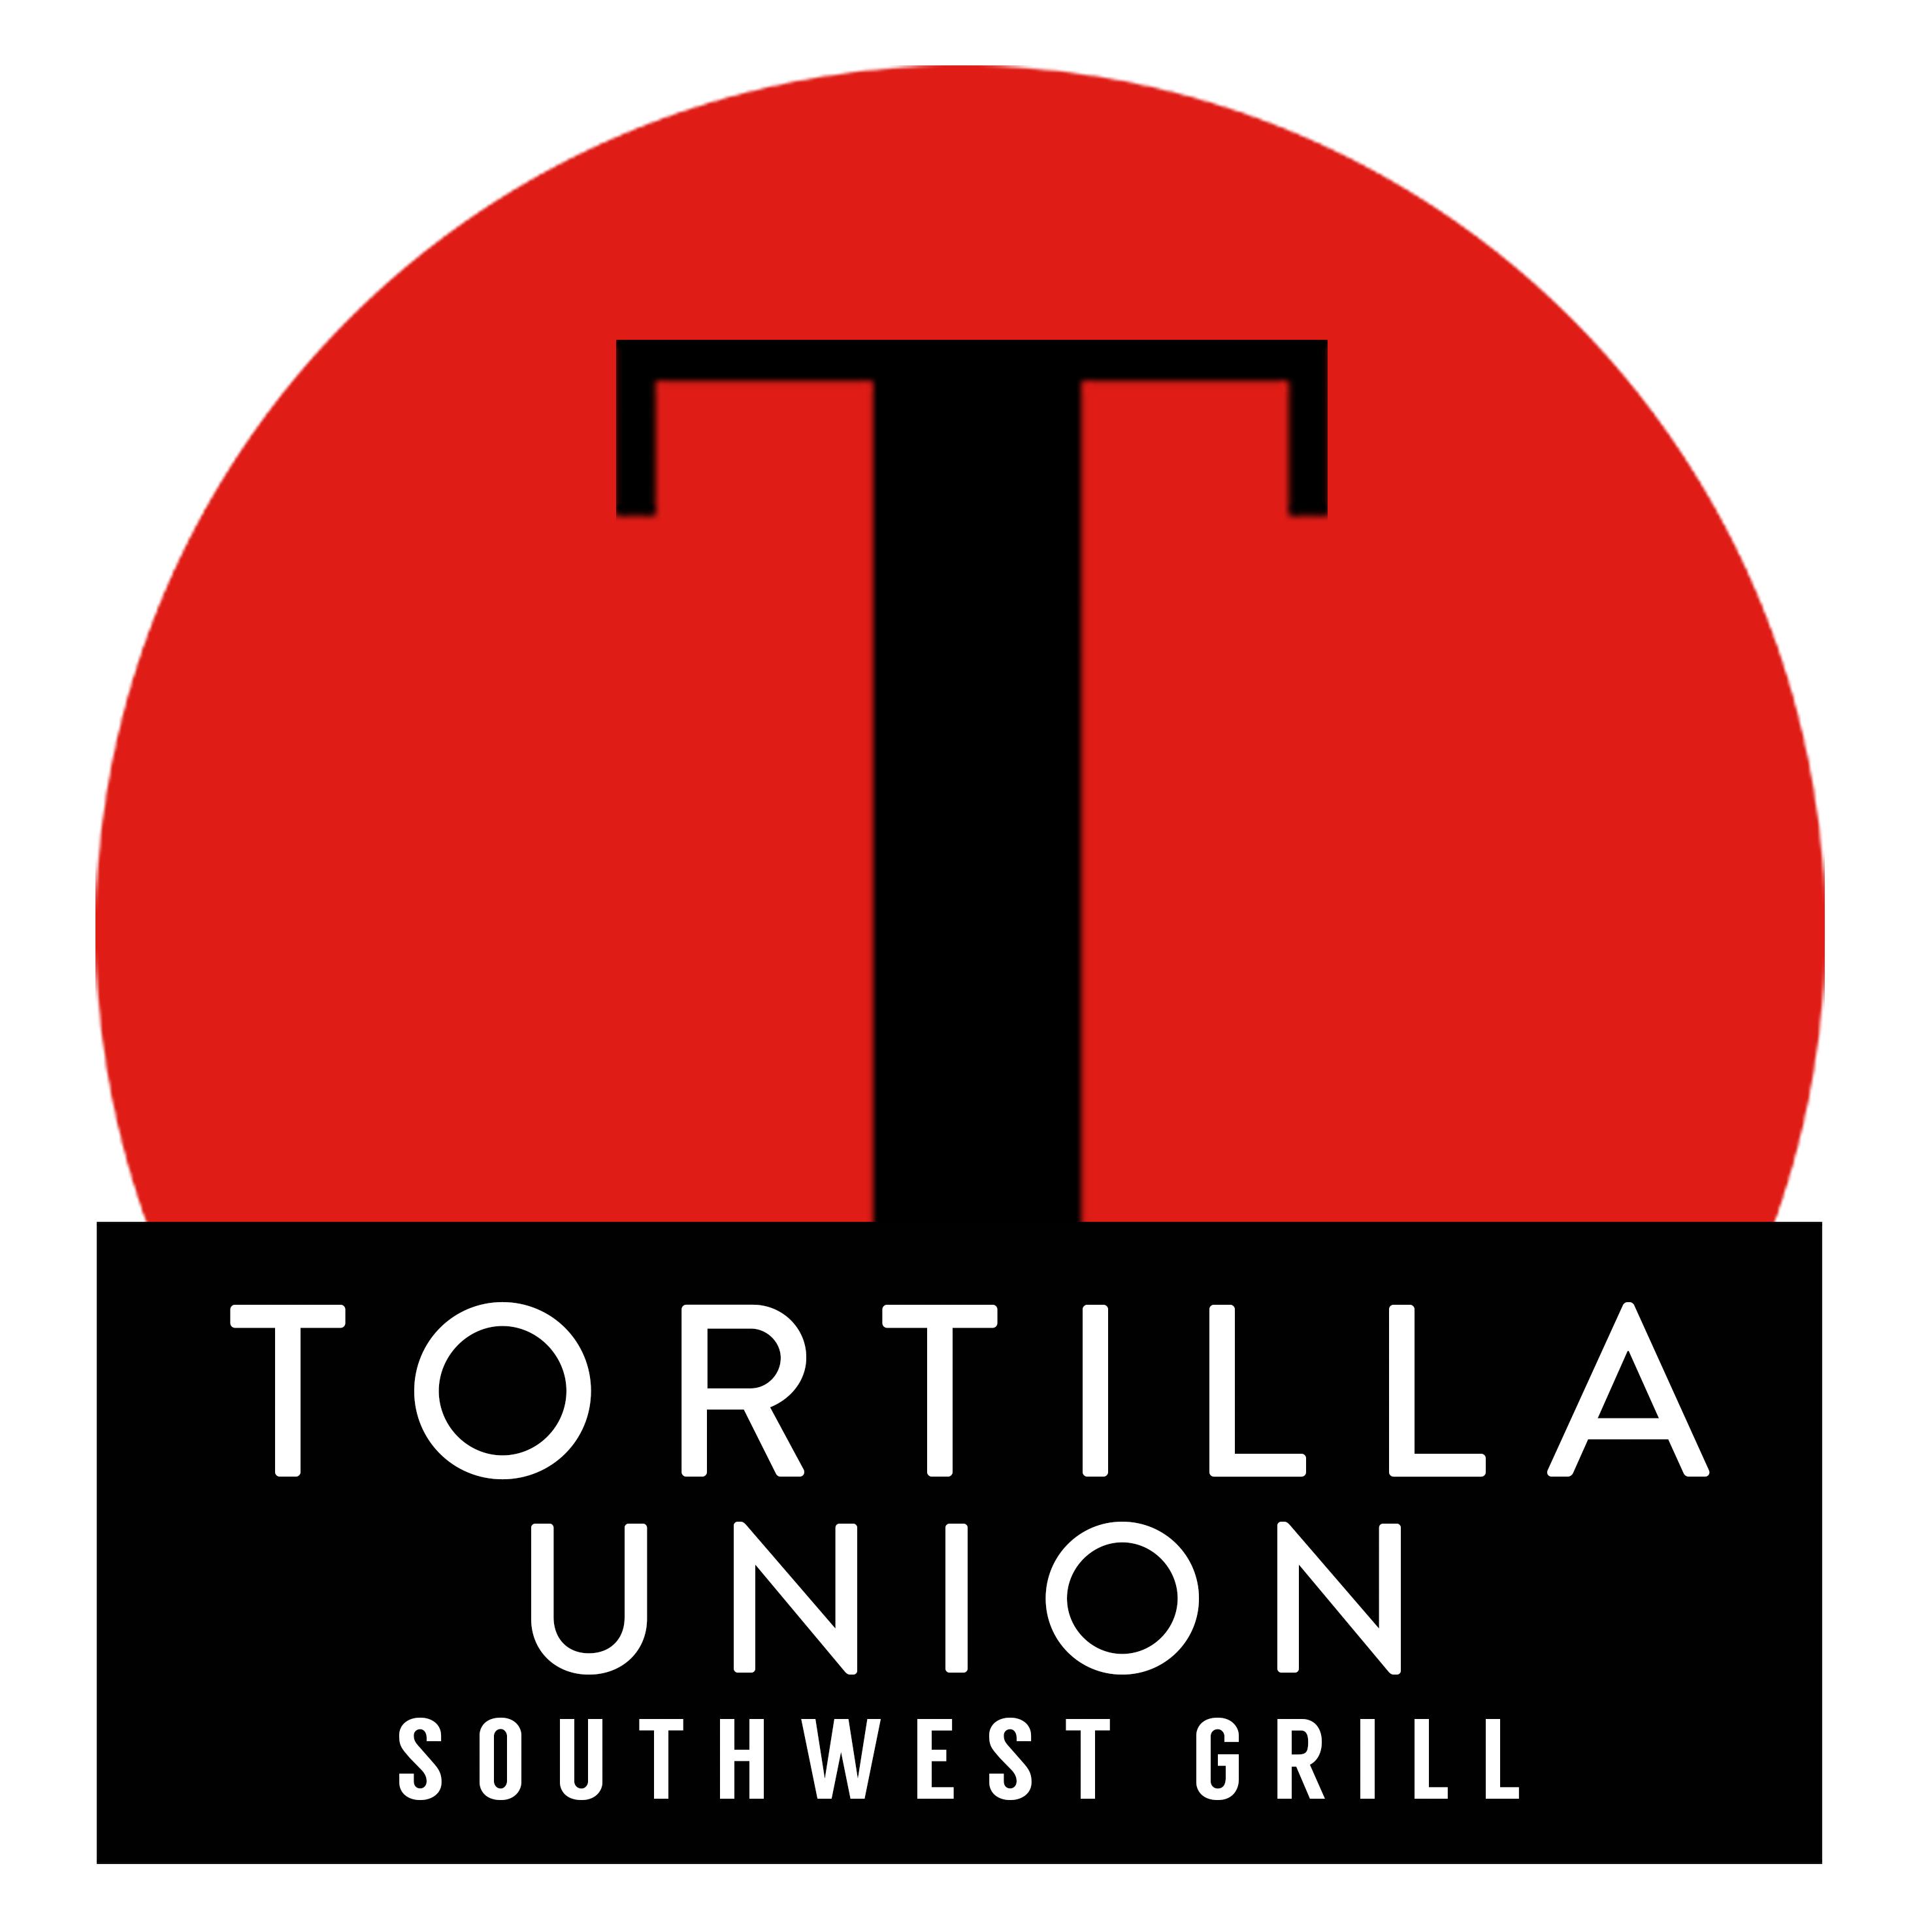 Tortilla Union Southwest Grill image 6